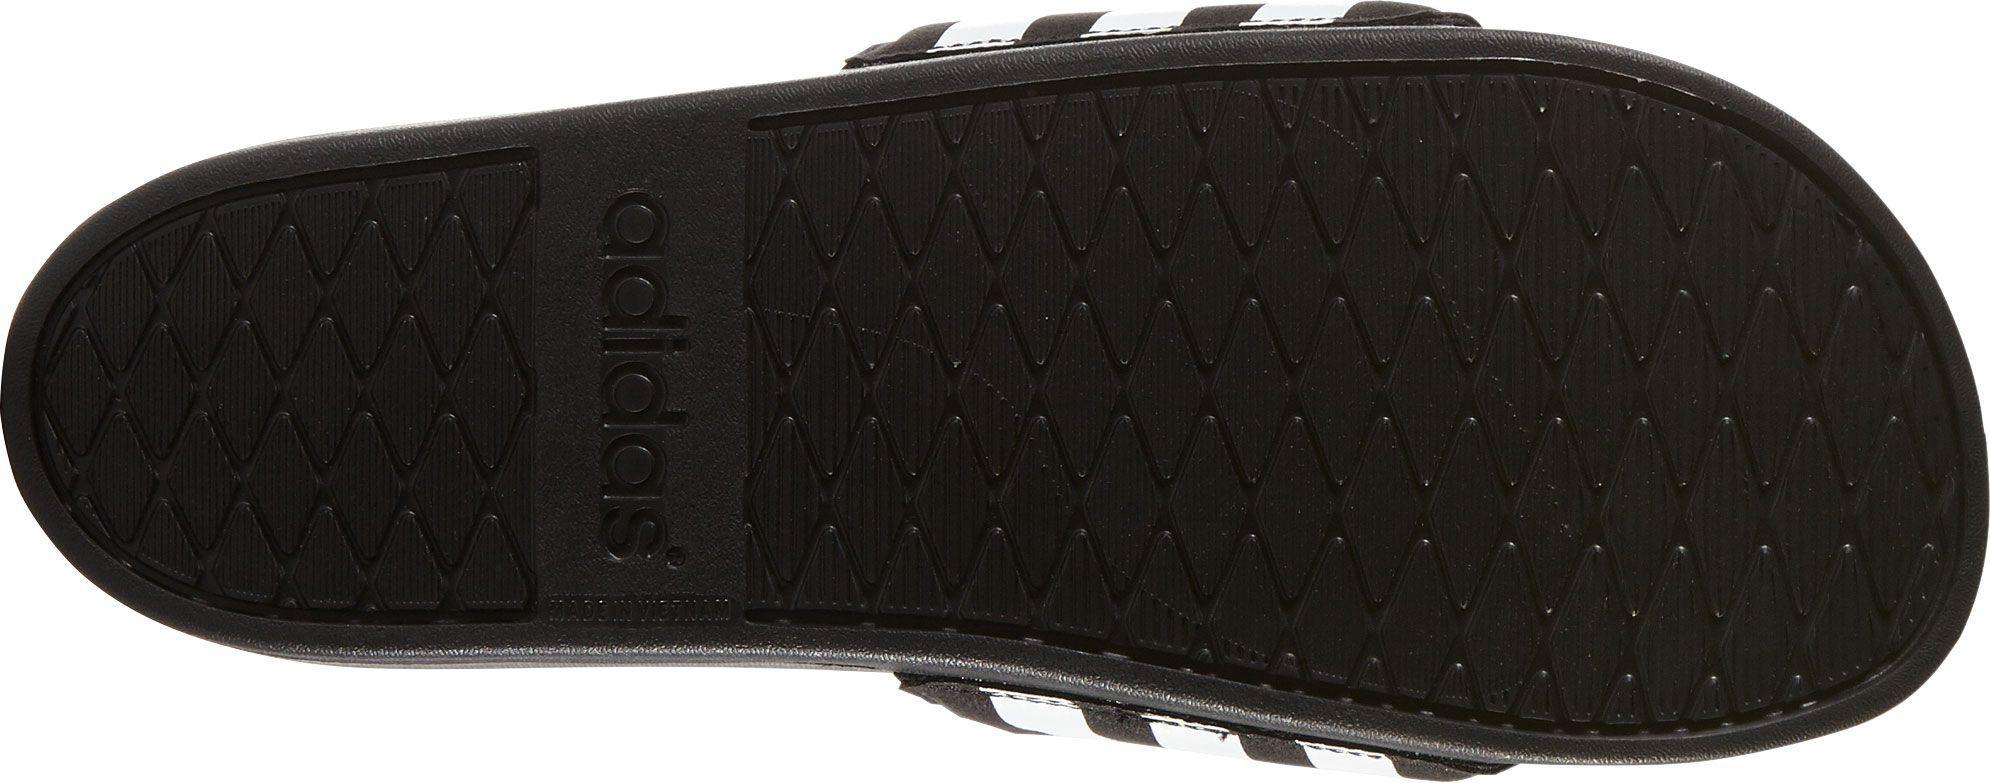 667797577 Lyst - adidas Adilette Supercloud Plus Su Slides in Black for Men